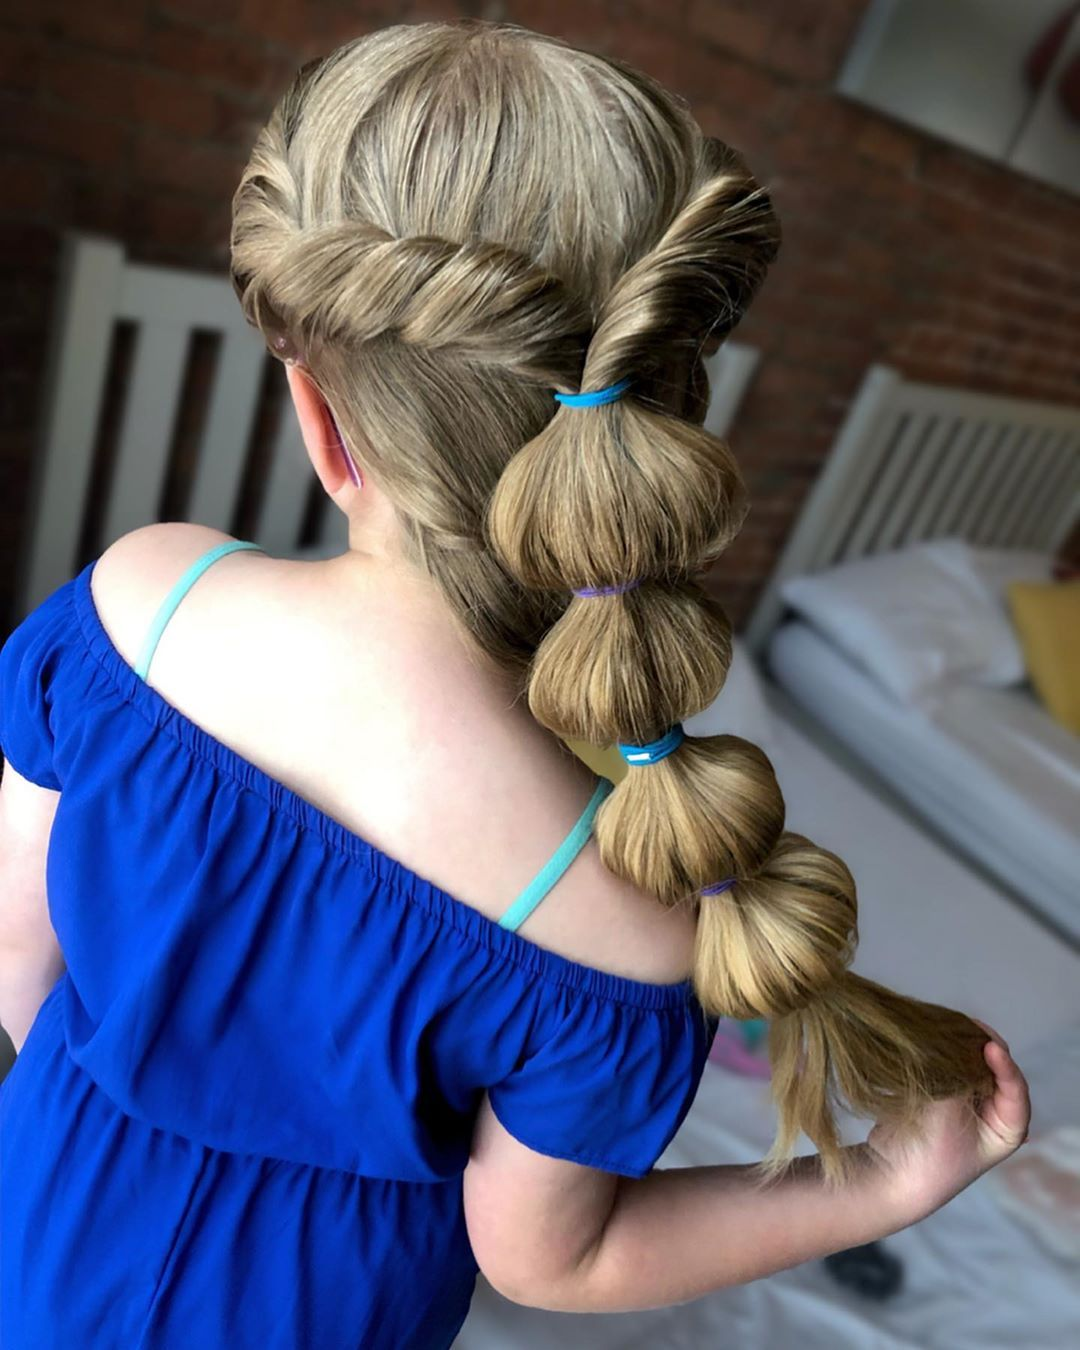 20 Braid Hairstyles Ideas For Little Girl 8211 Trending 2019 Princess Hairstyles Kids Hairstyles Hair Styles